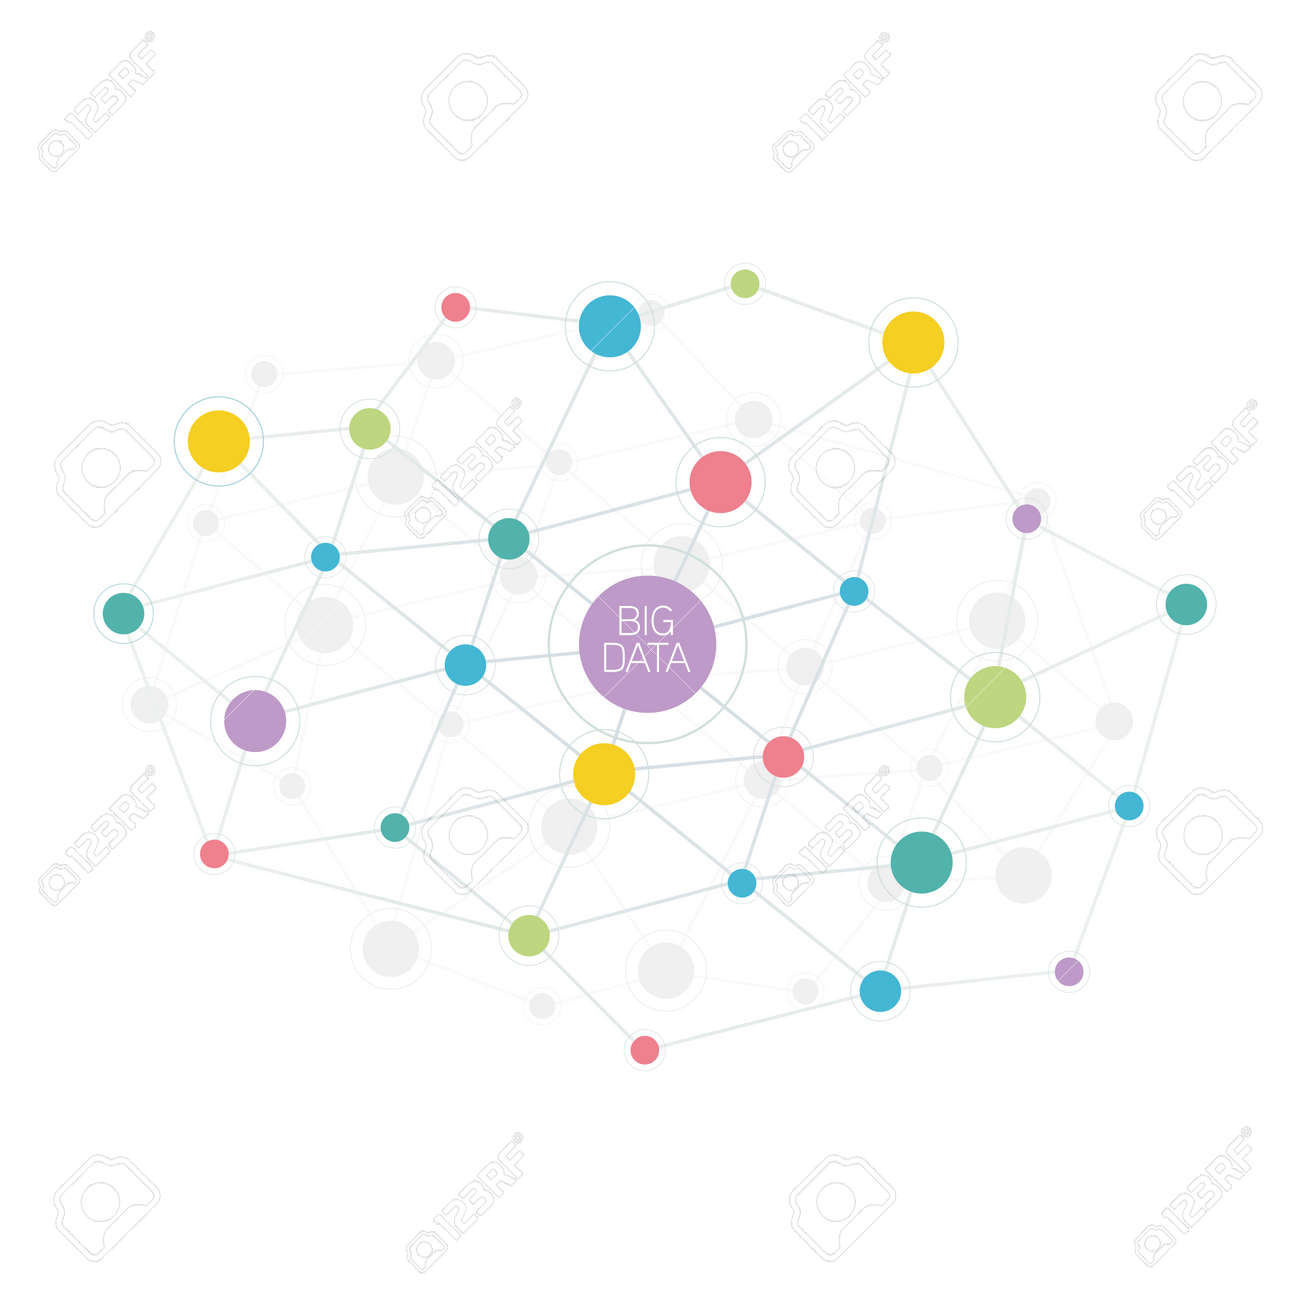 Big data abstract molecule illustration - 66768075